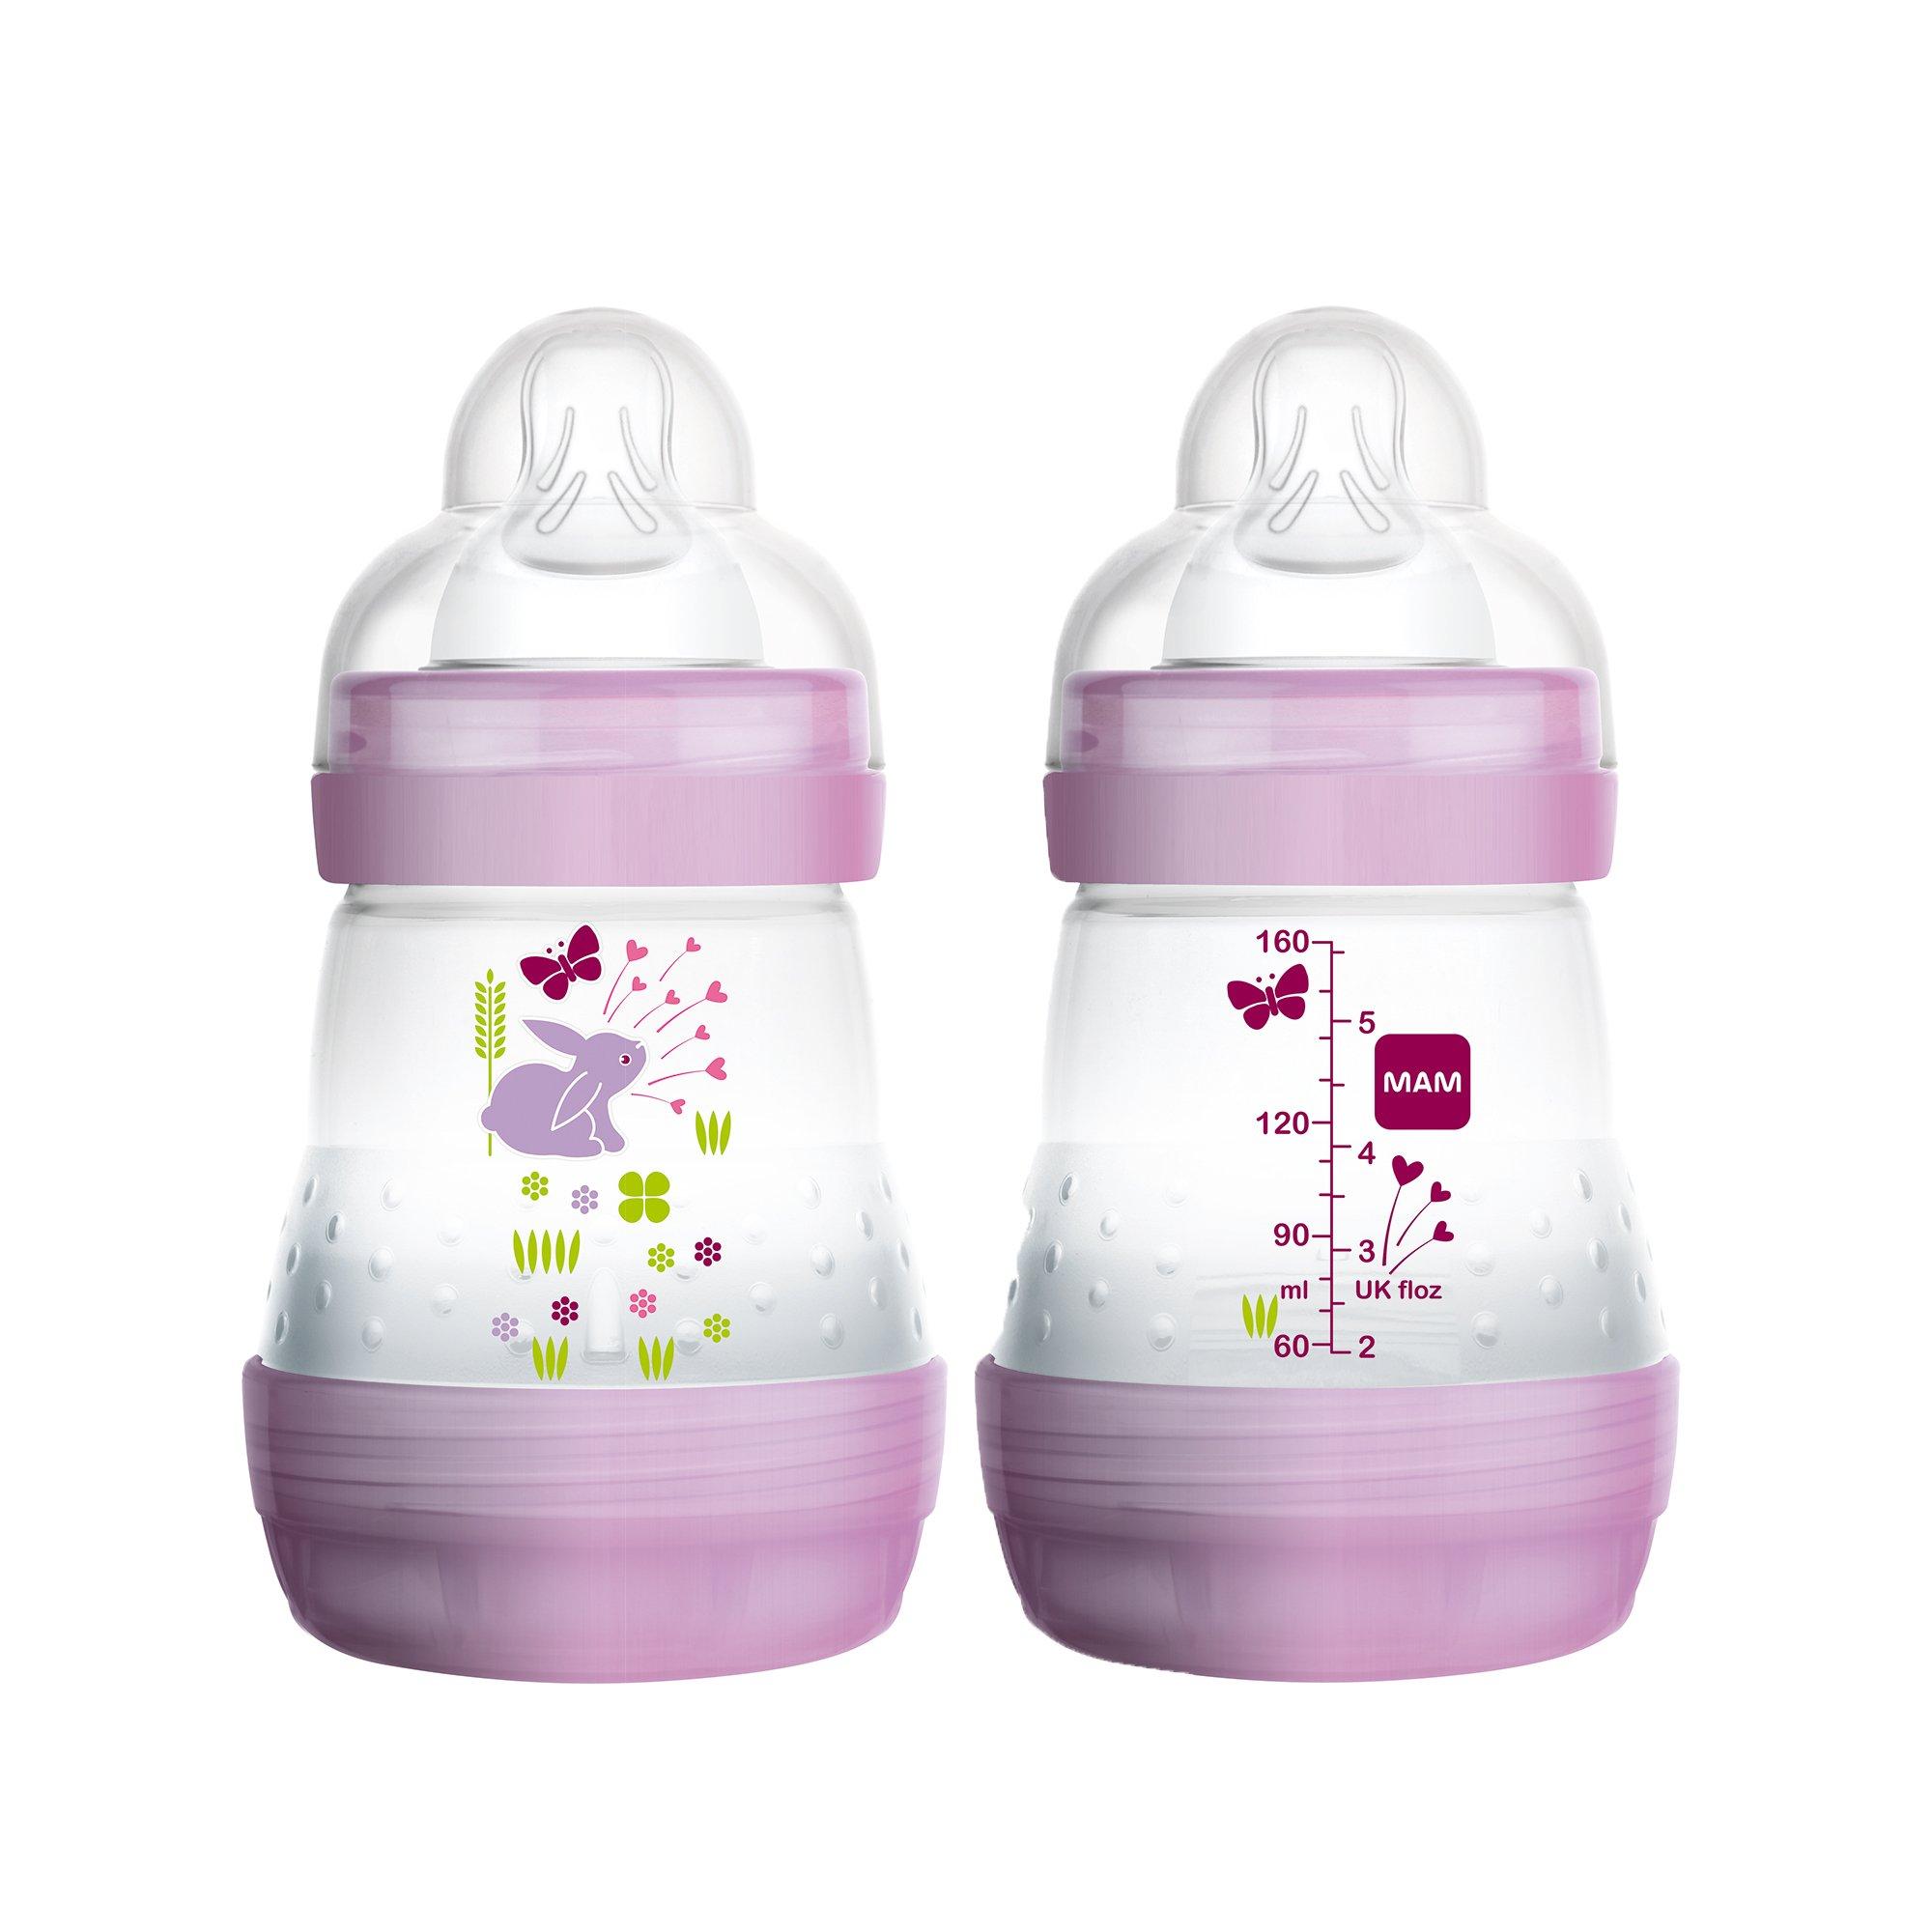 MAM Baby Bottles for Breastfed Babies, MAM Baby Bottles Anti Colic, Girl, 5 Ounces, 2-Count